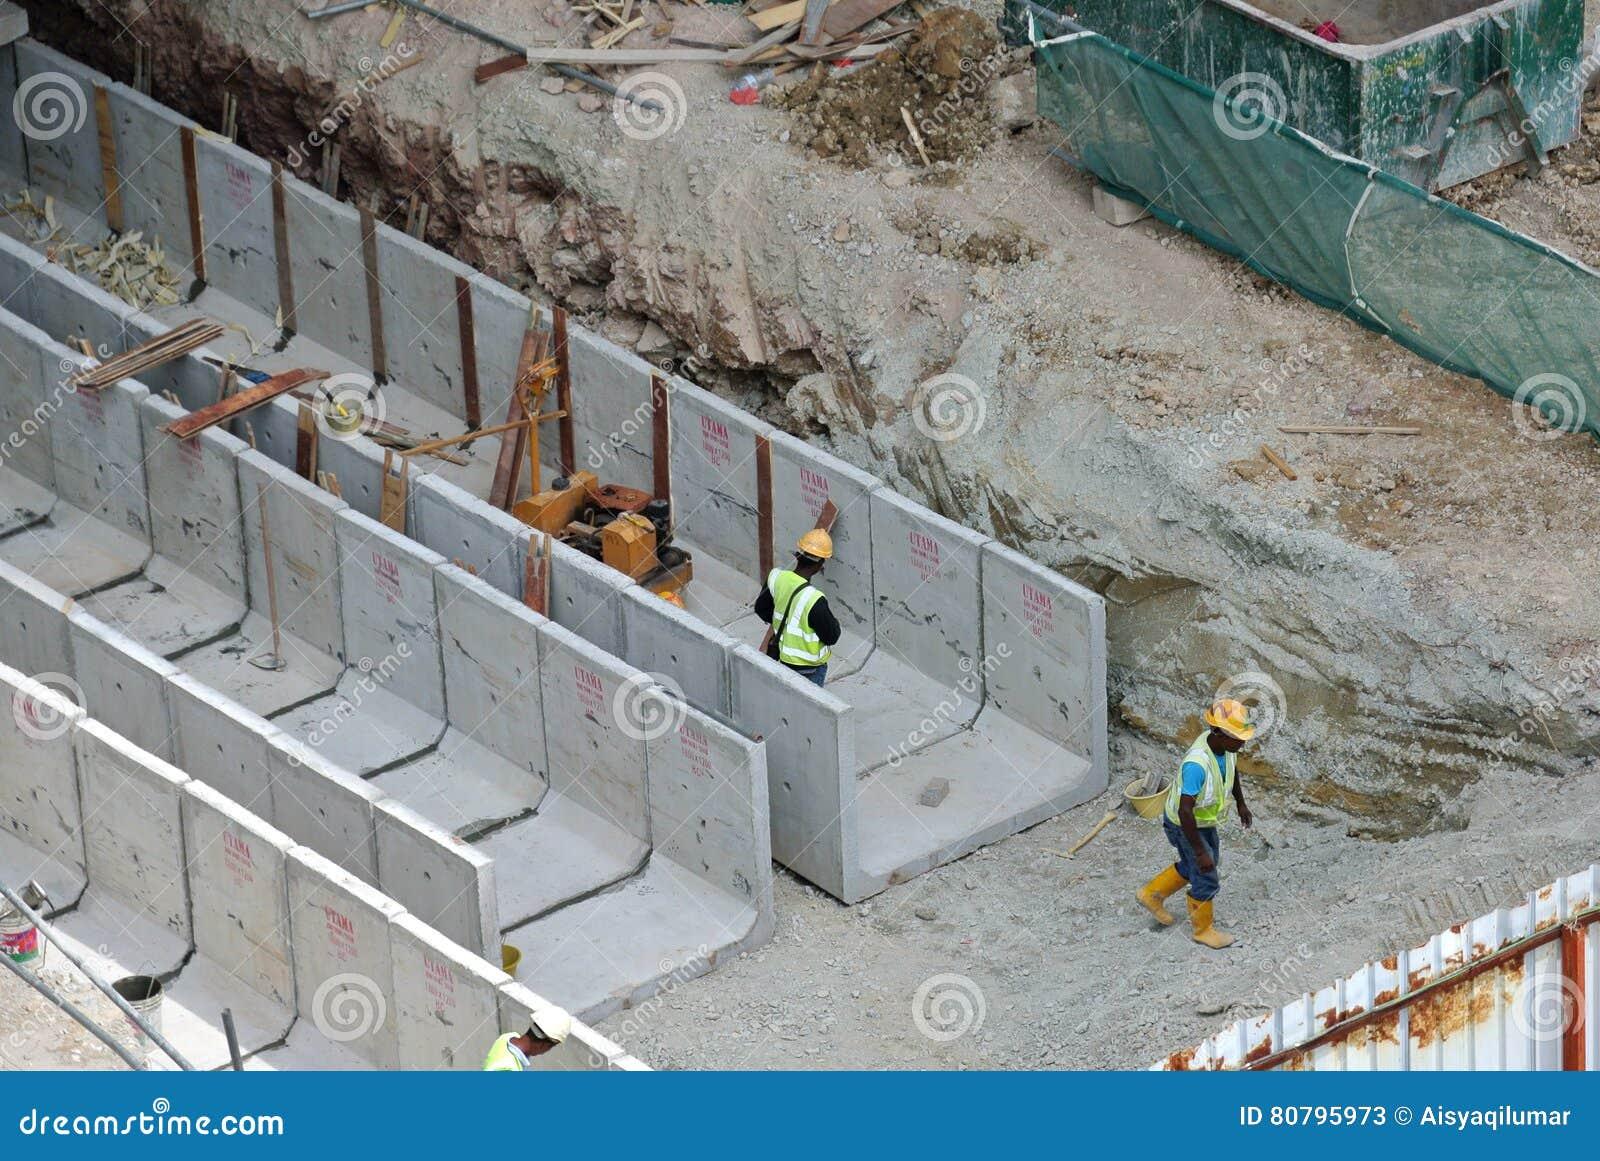 Construction Workers Installing Precast Concrete Drain